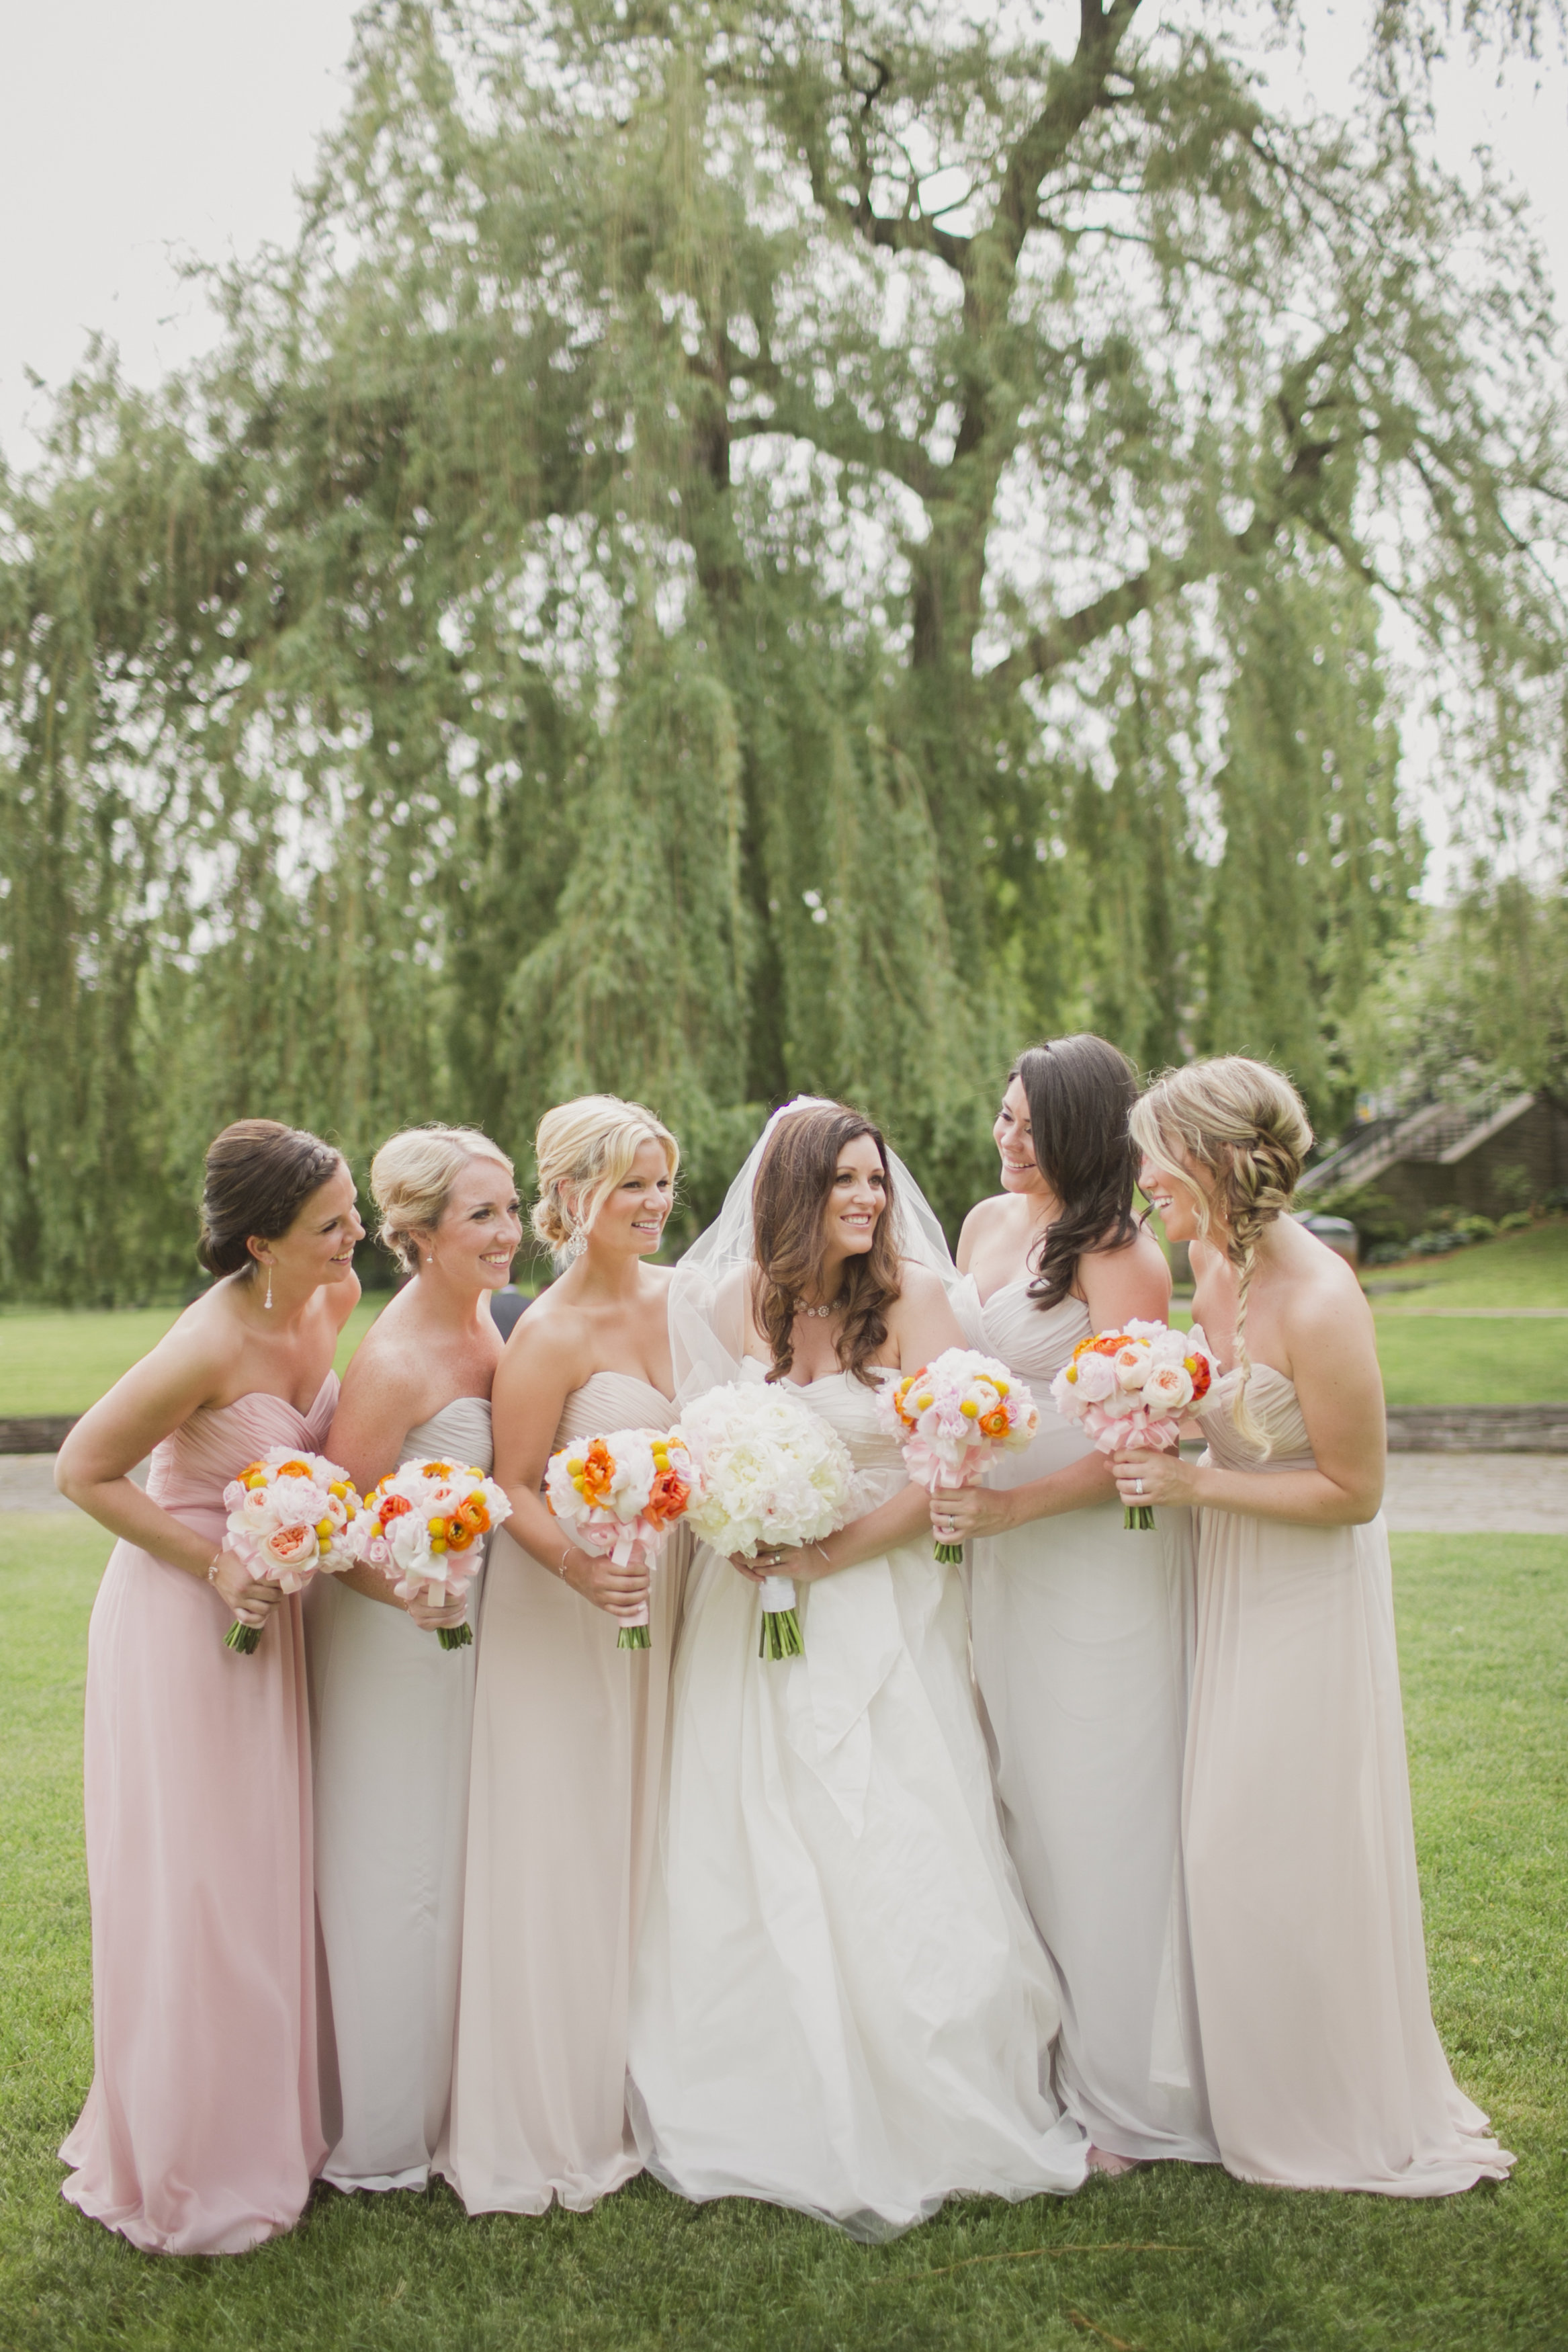 mismatched bridesmaids kj and co burlington golf and country club wedding photos oakville wedding planner, spencer smith park burlington